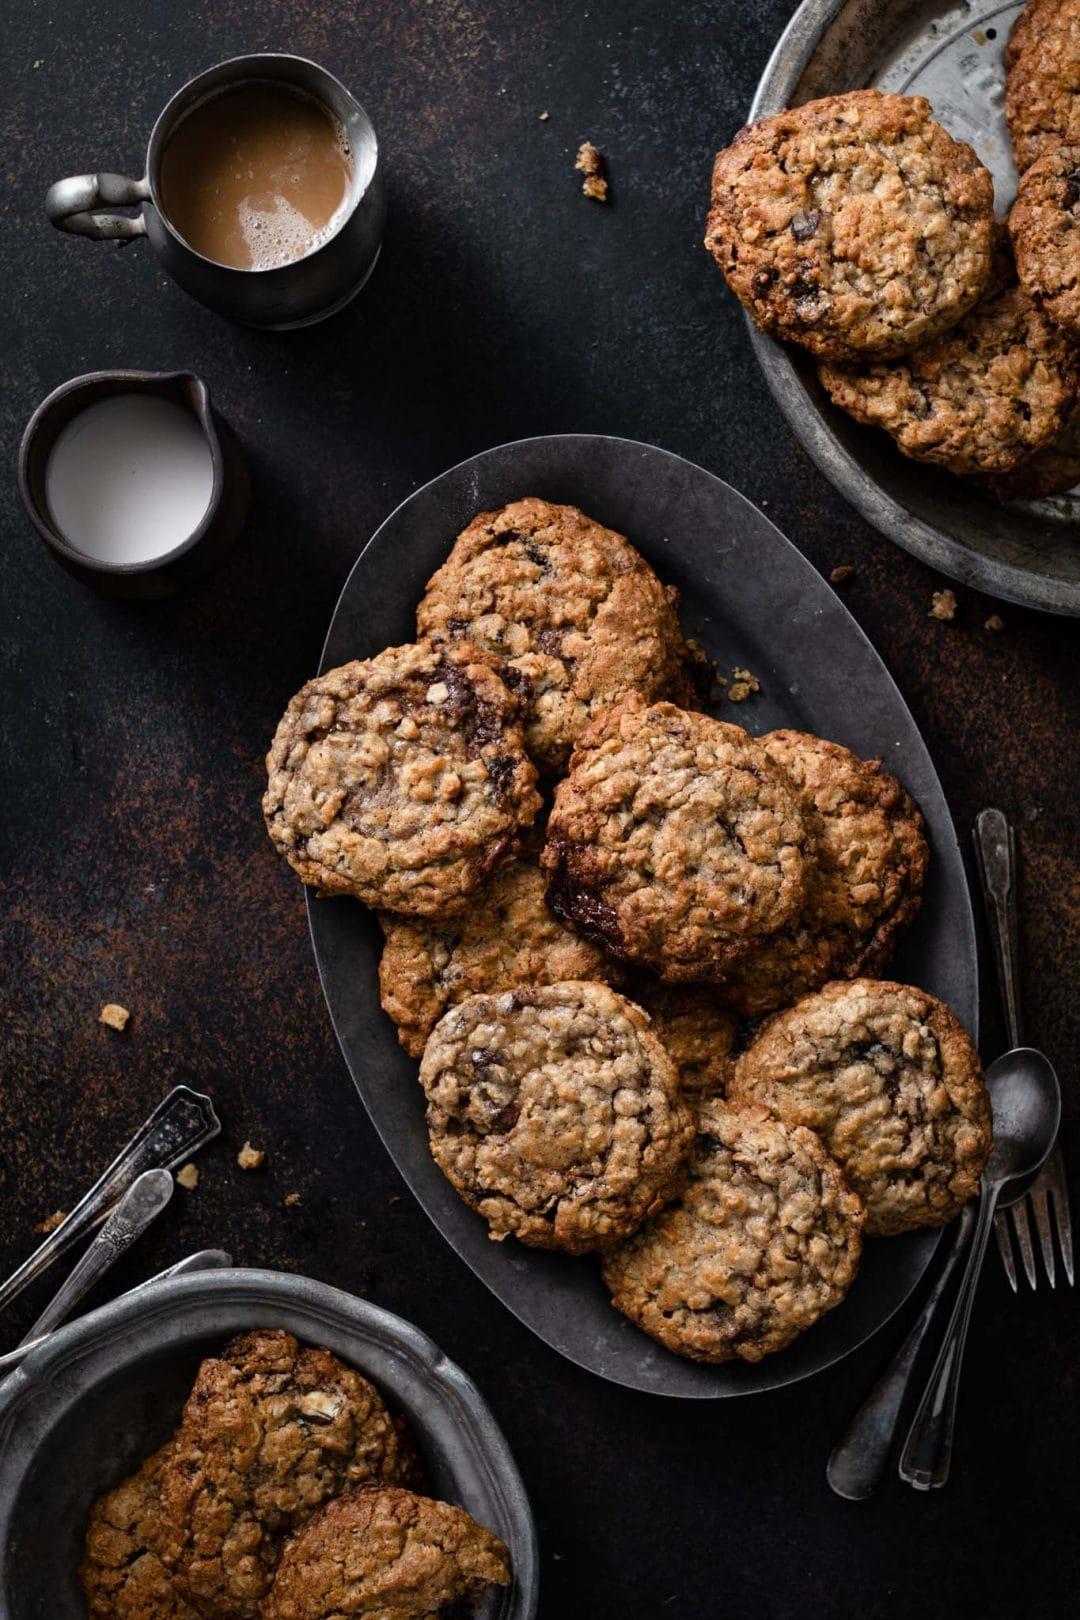 Oatmeal cookies full of chocolate truffles.